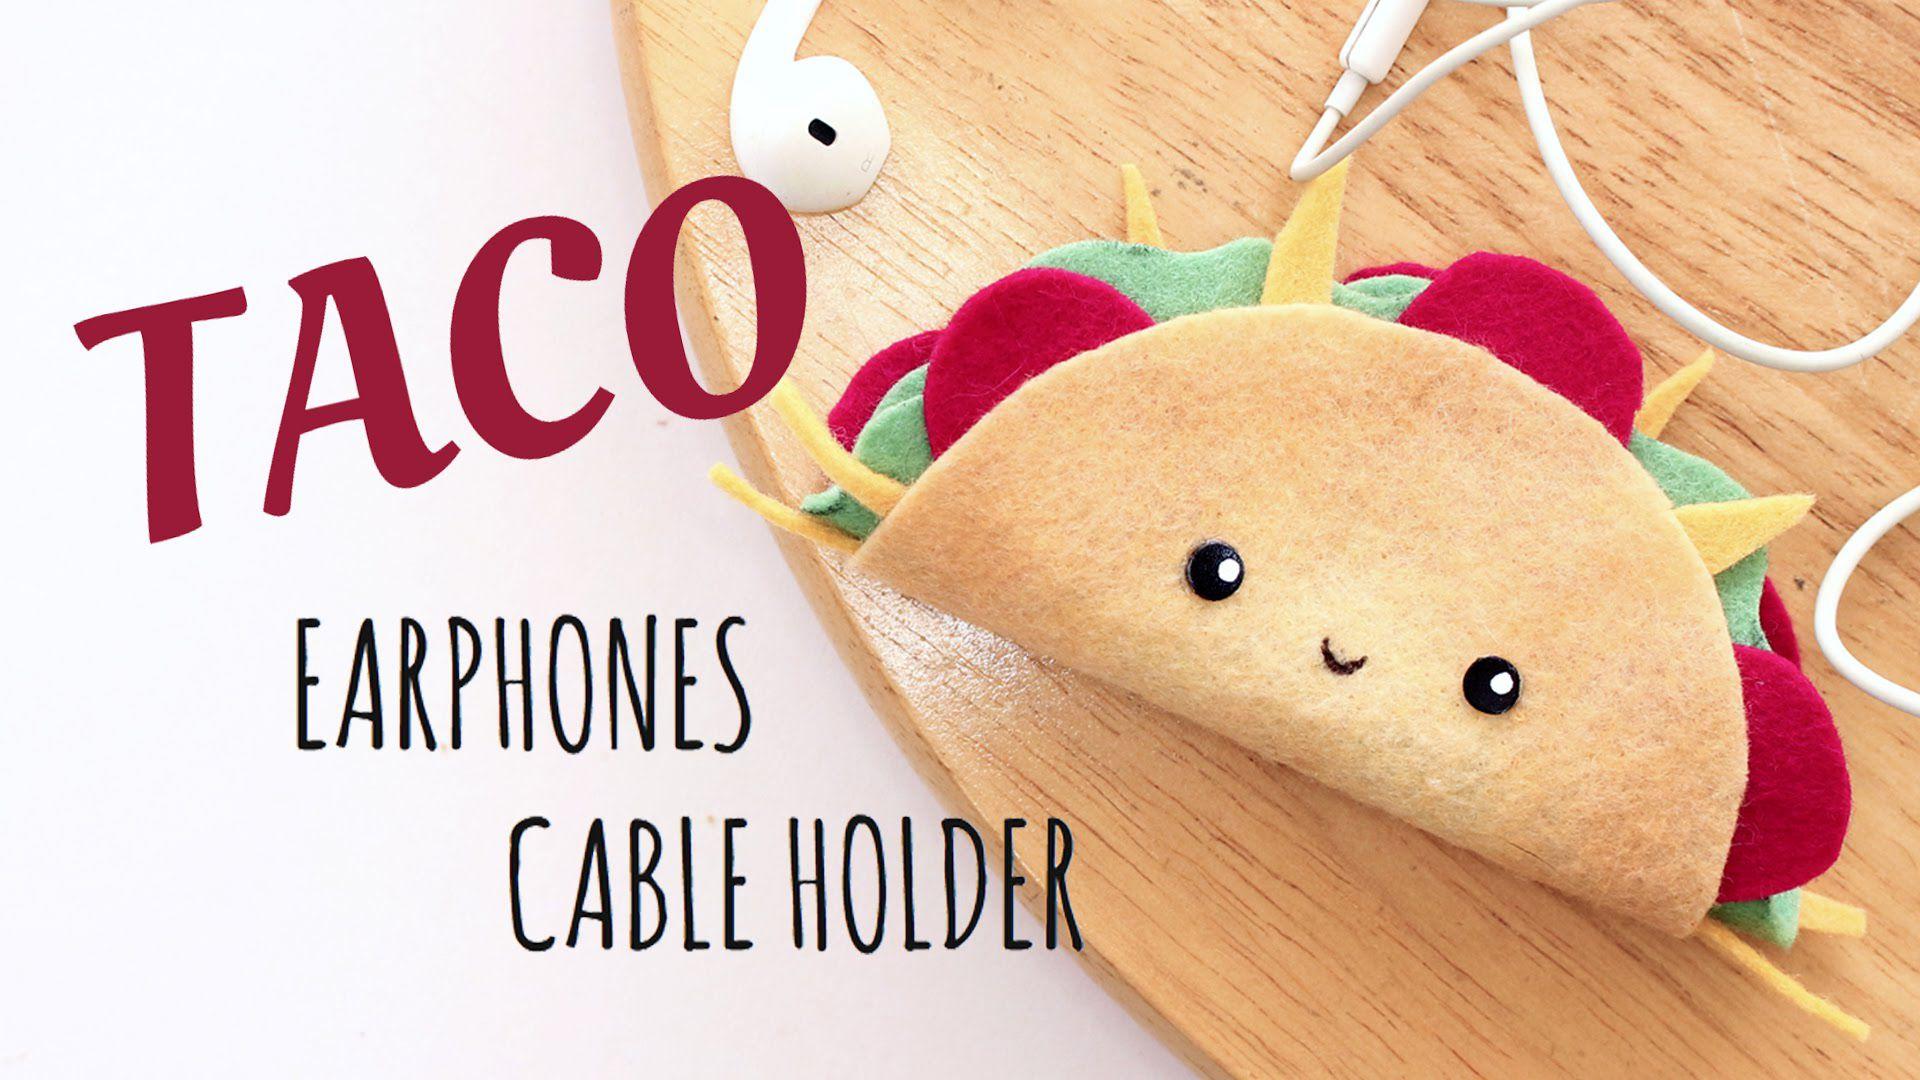 abbihome diyholder earphones taco